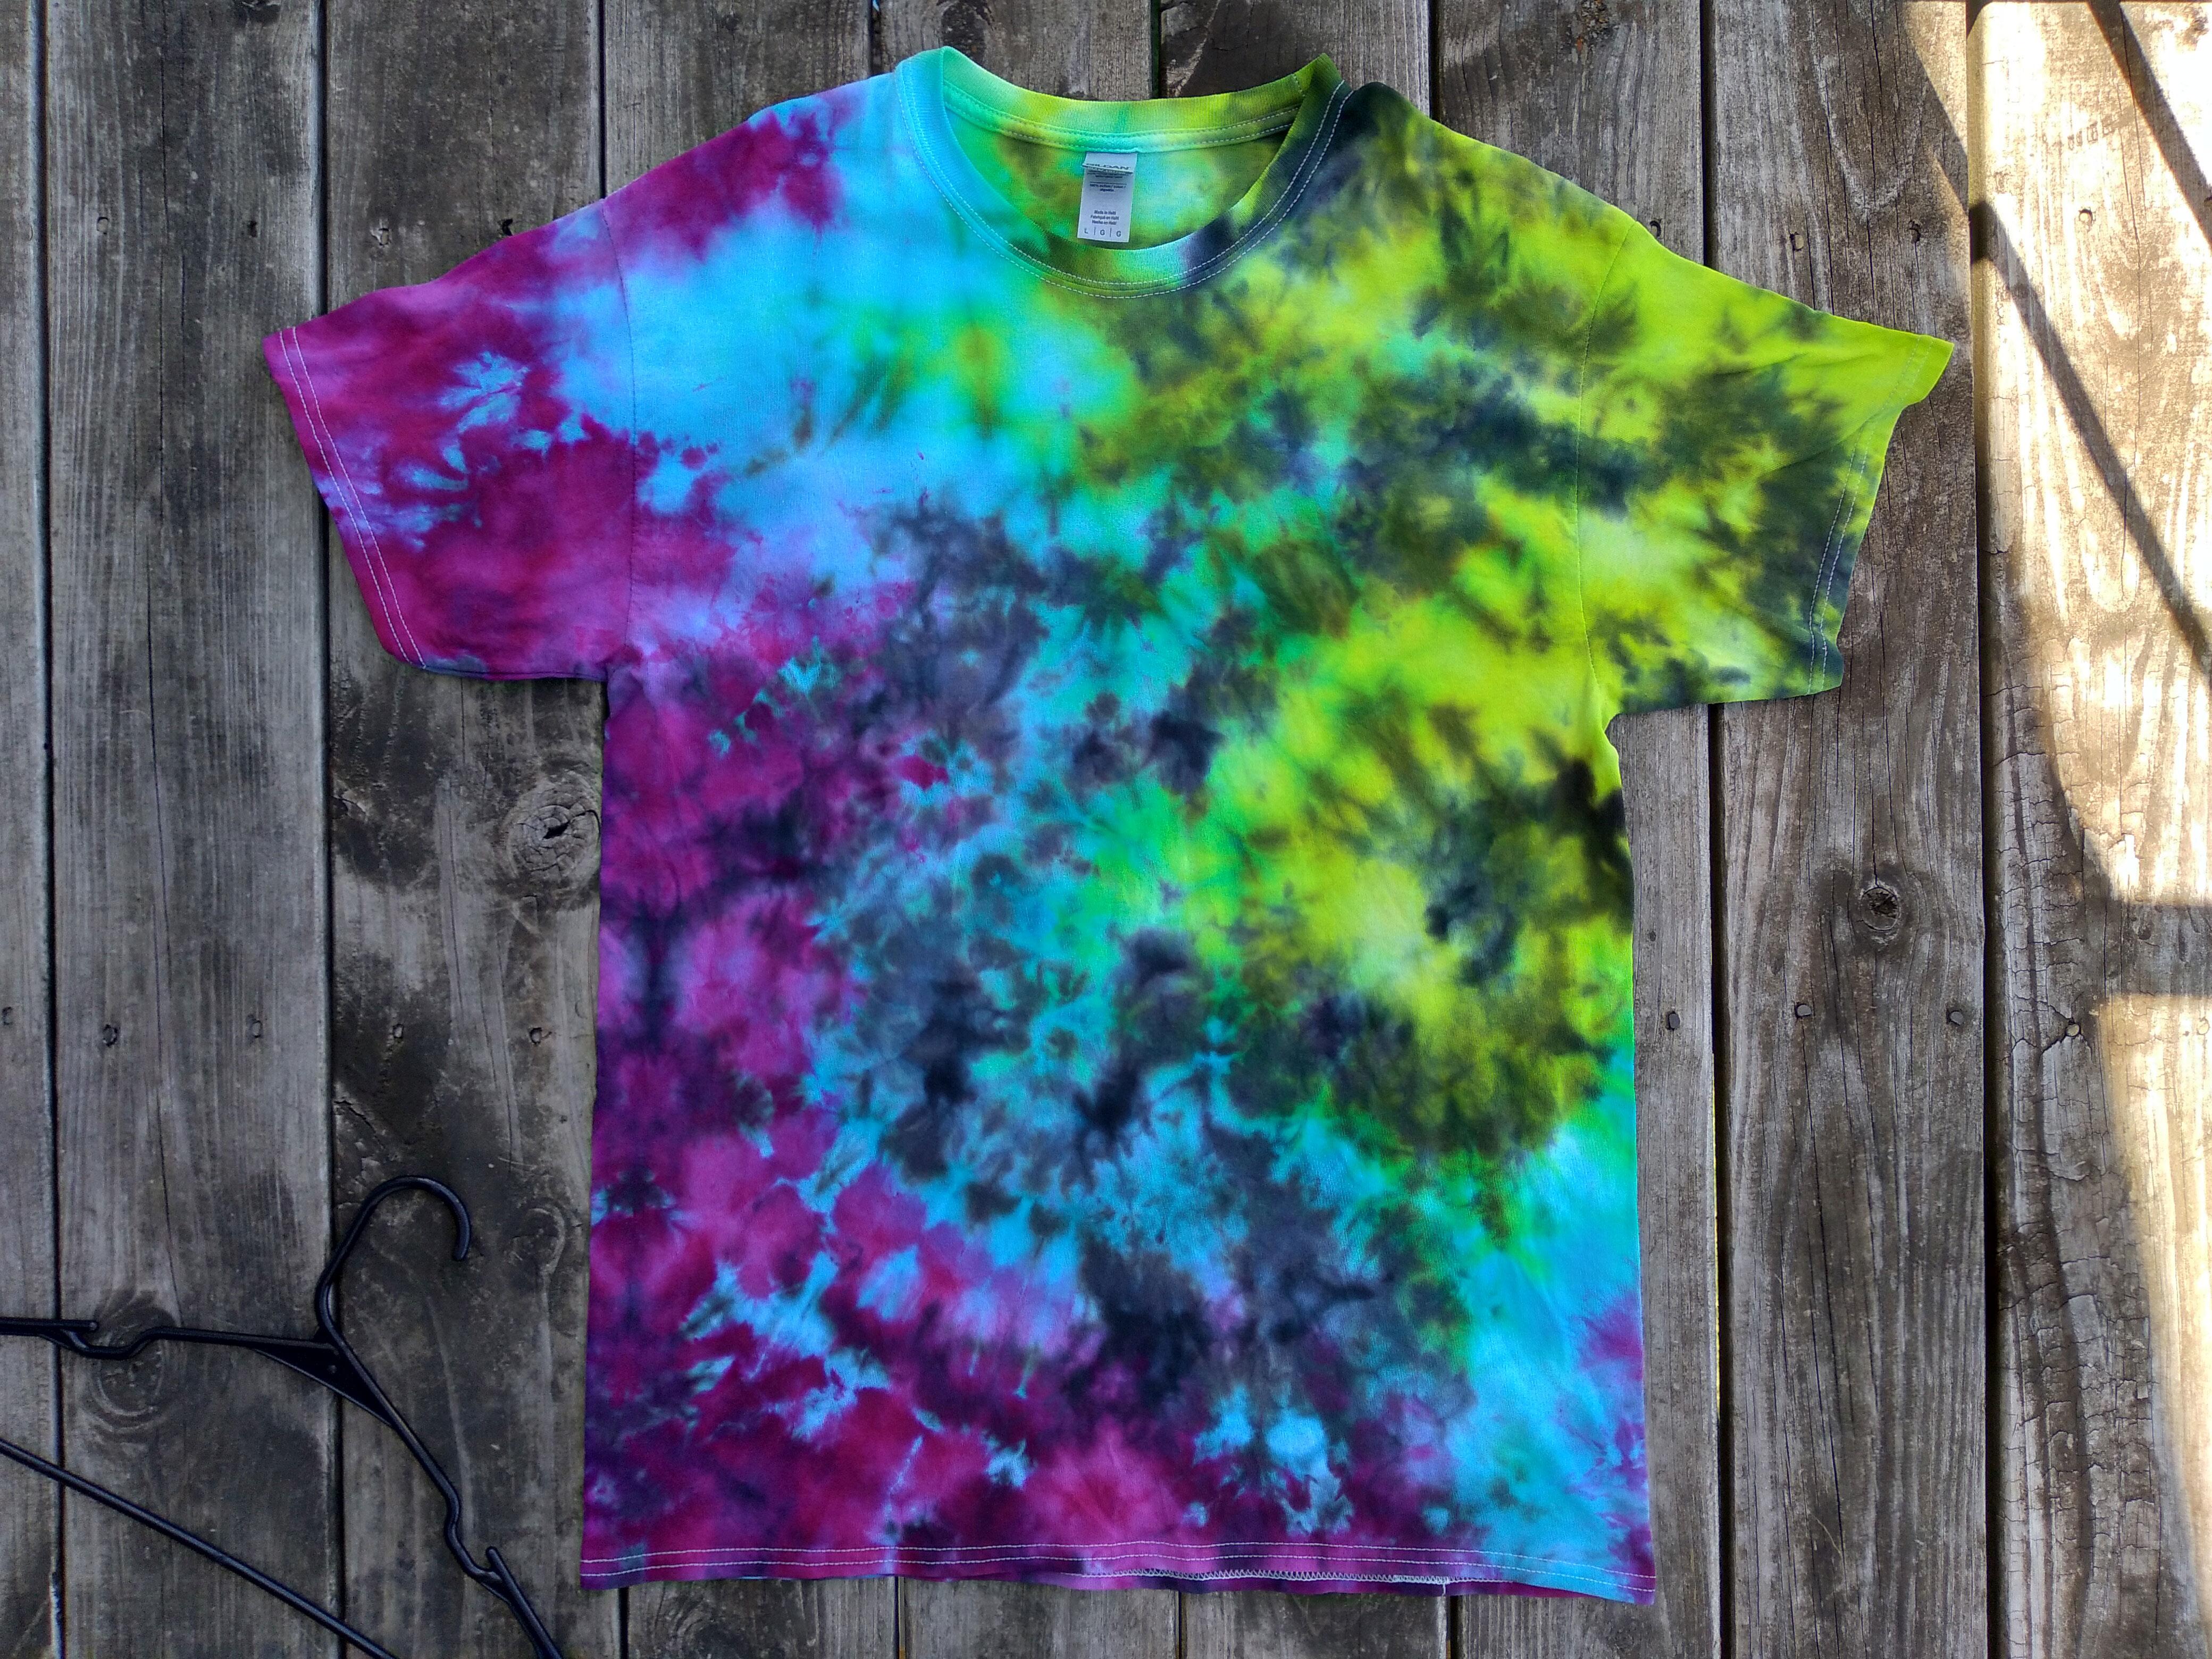 Aurora Borealis themed t-shirt